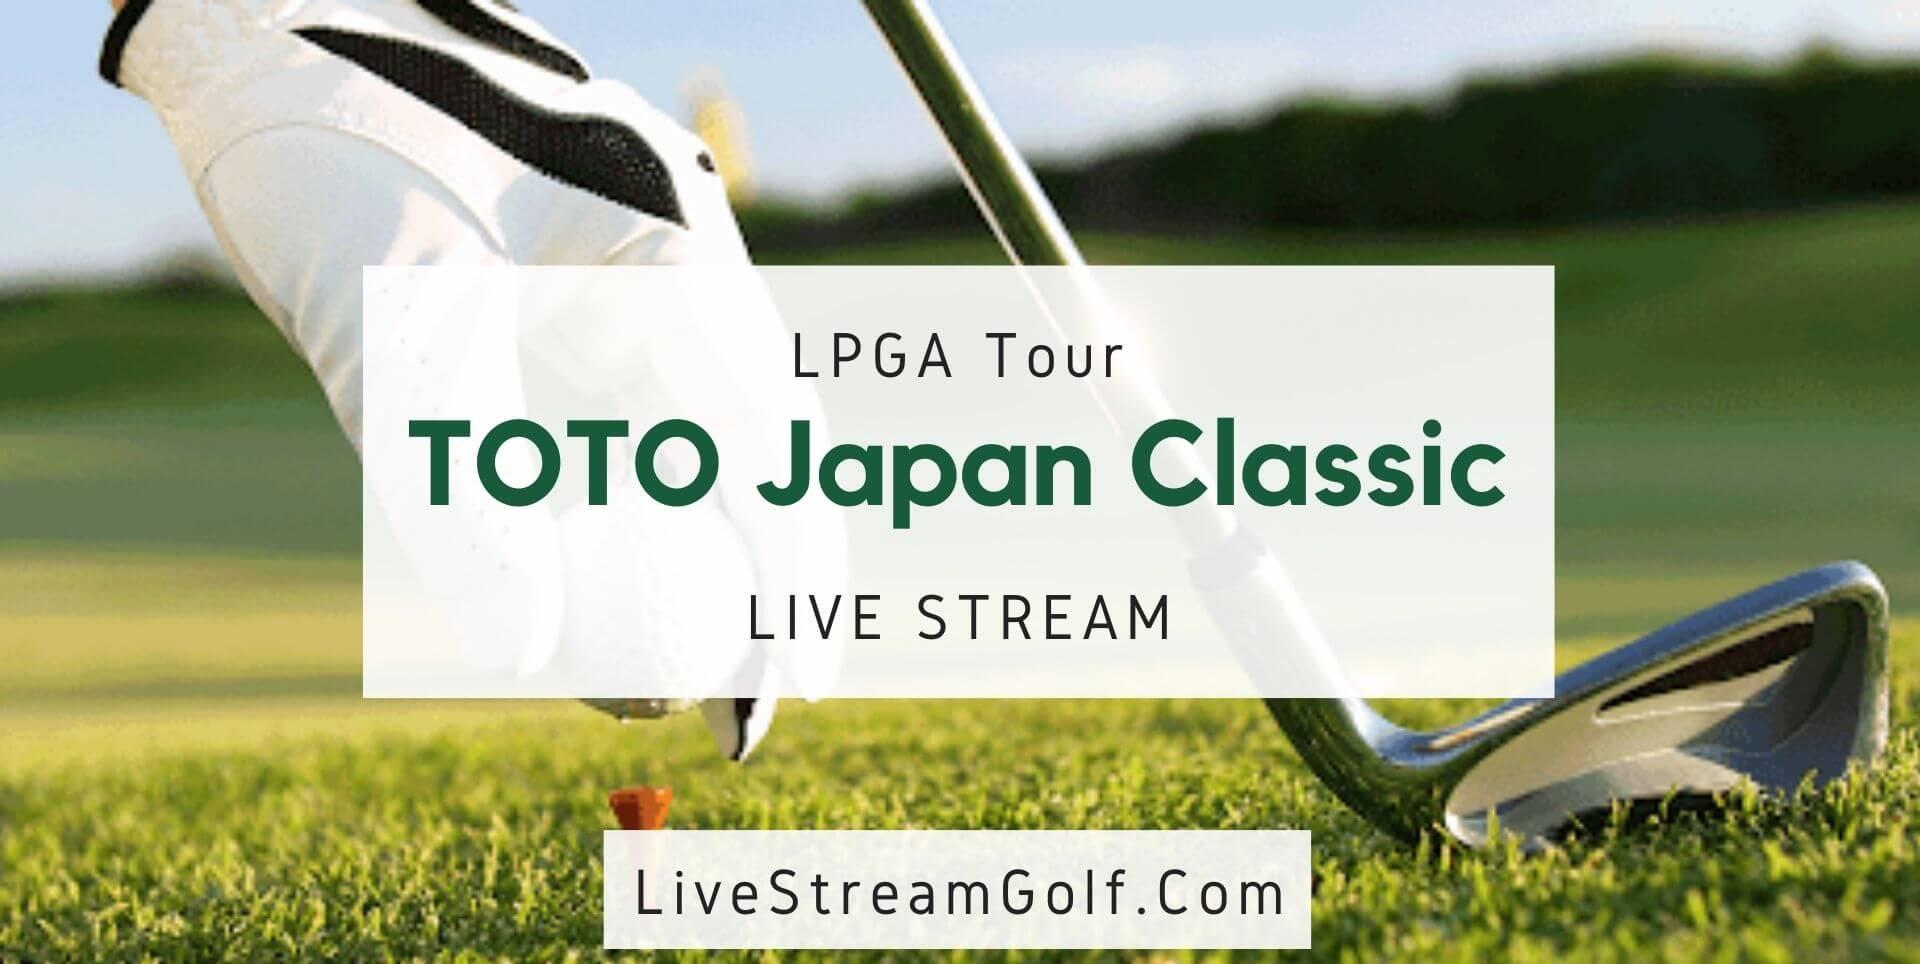 TOTO Japan Classic Rd 3 Live Stream: LPGA Tour 2021